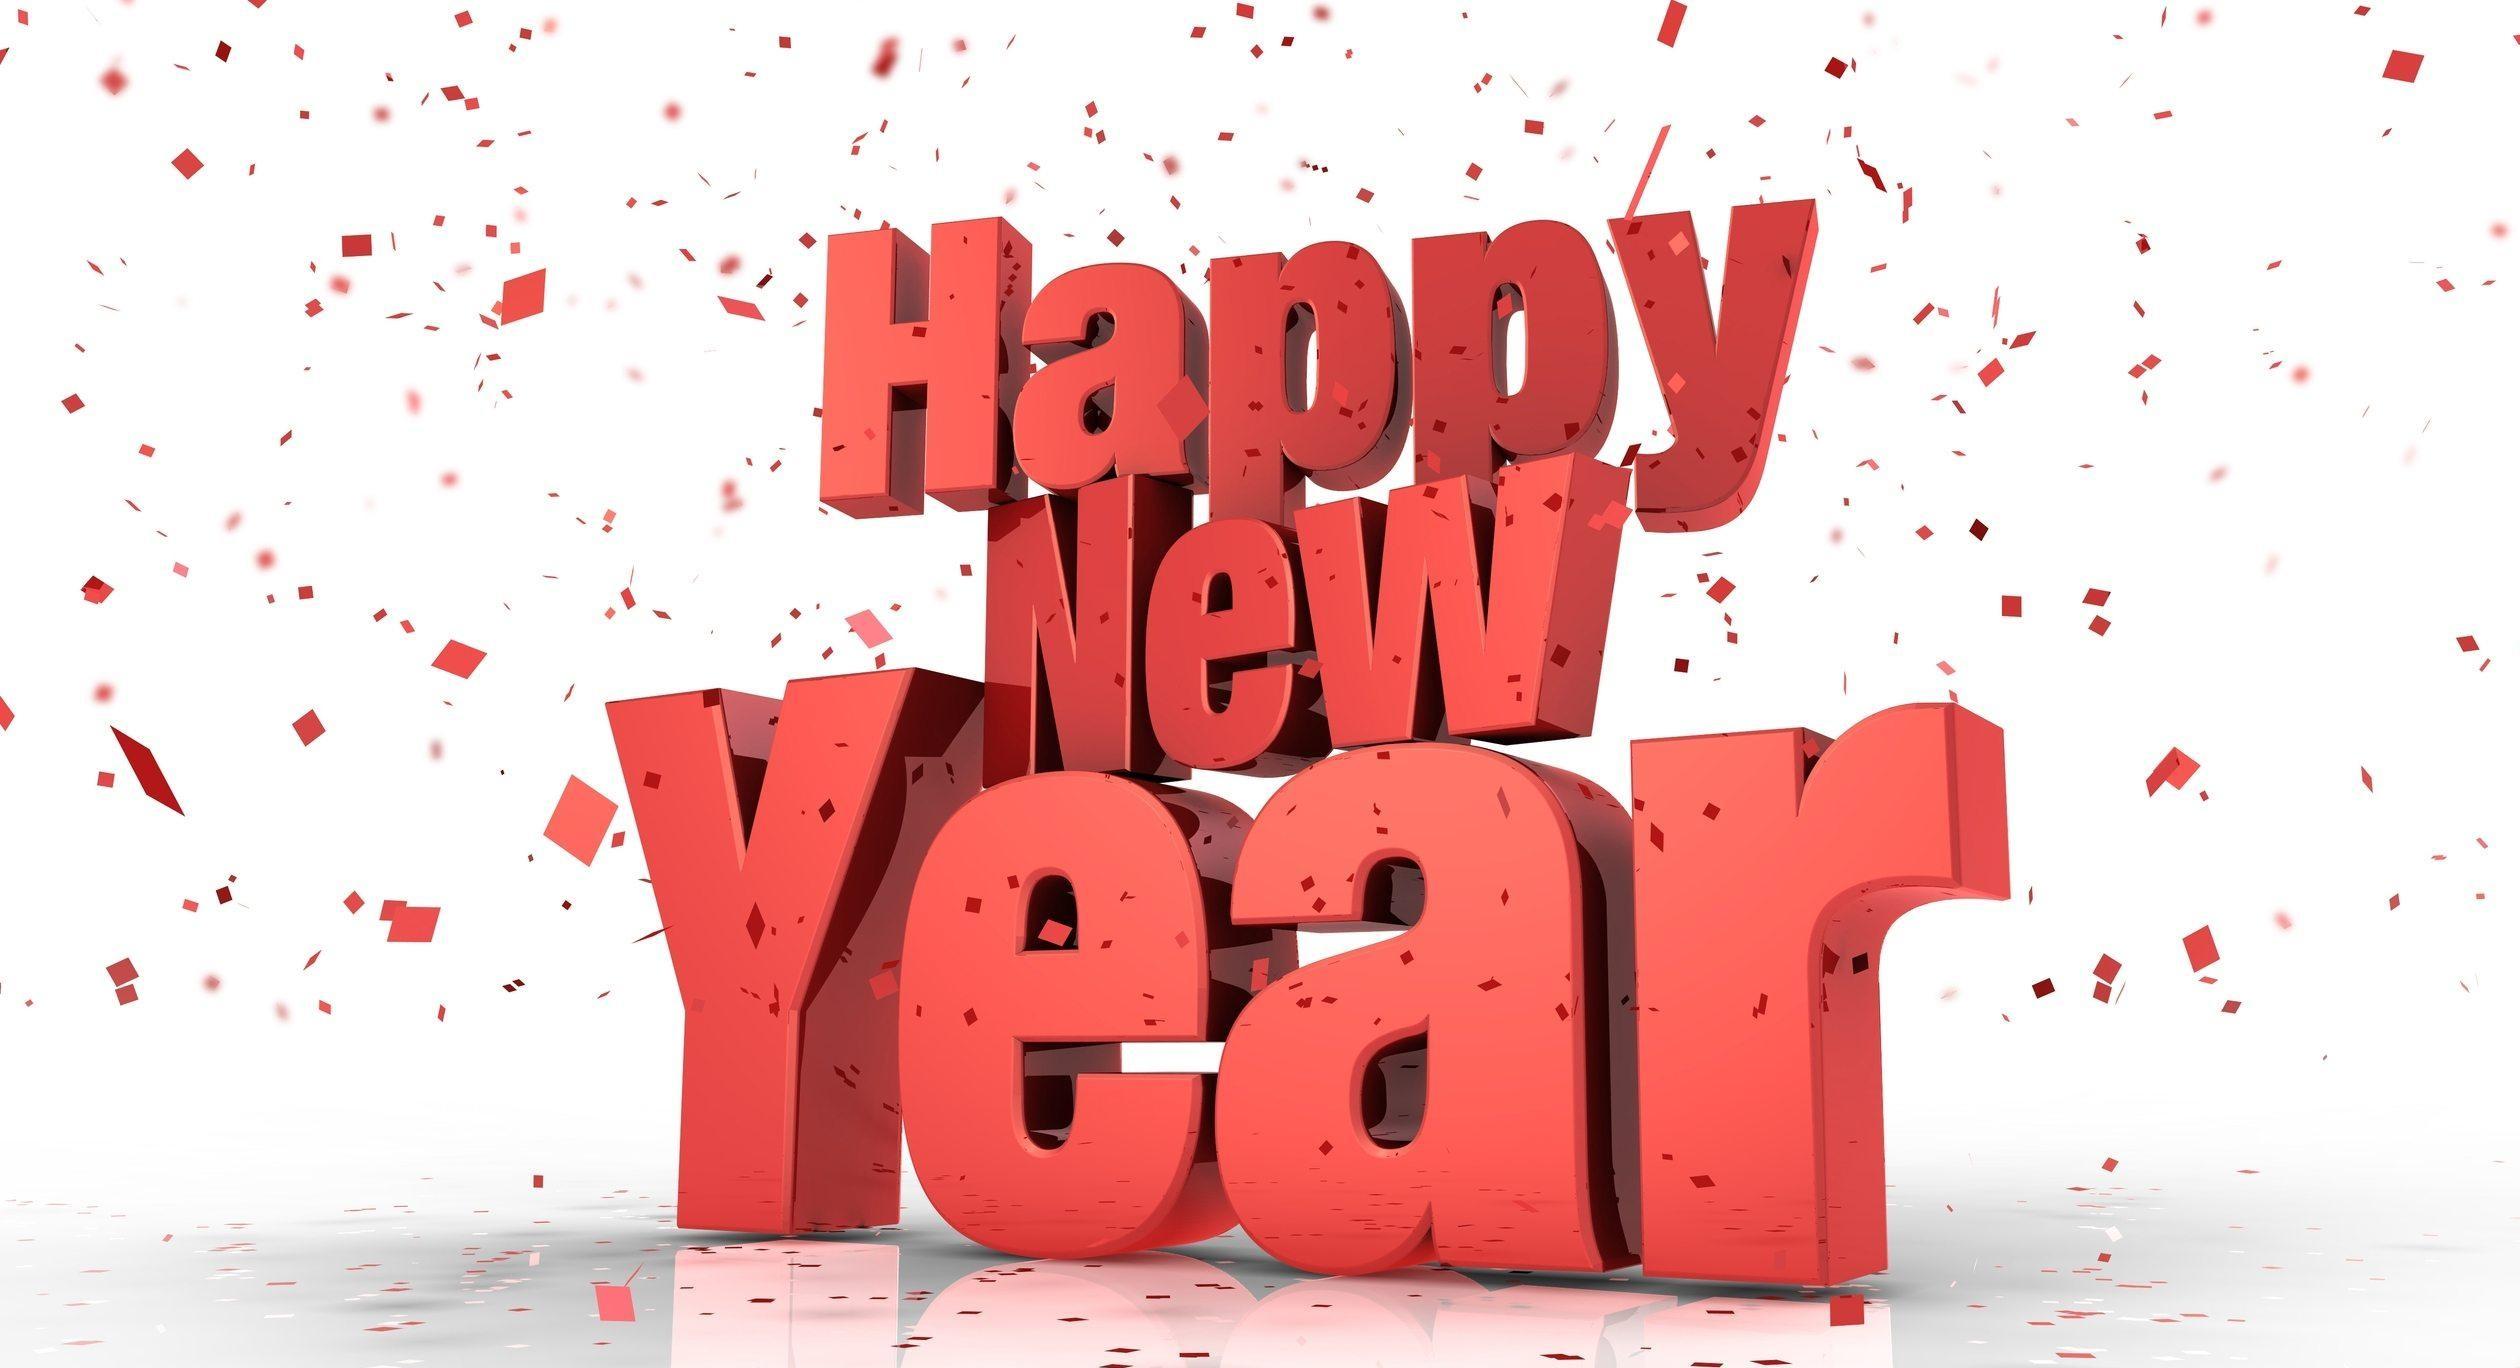 صور2016 عام جديد كل عام وانتم بخير بالصور (3)